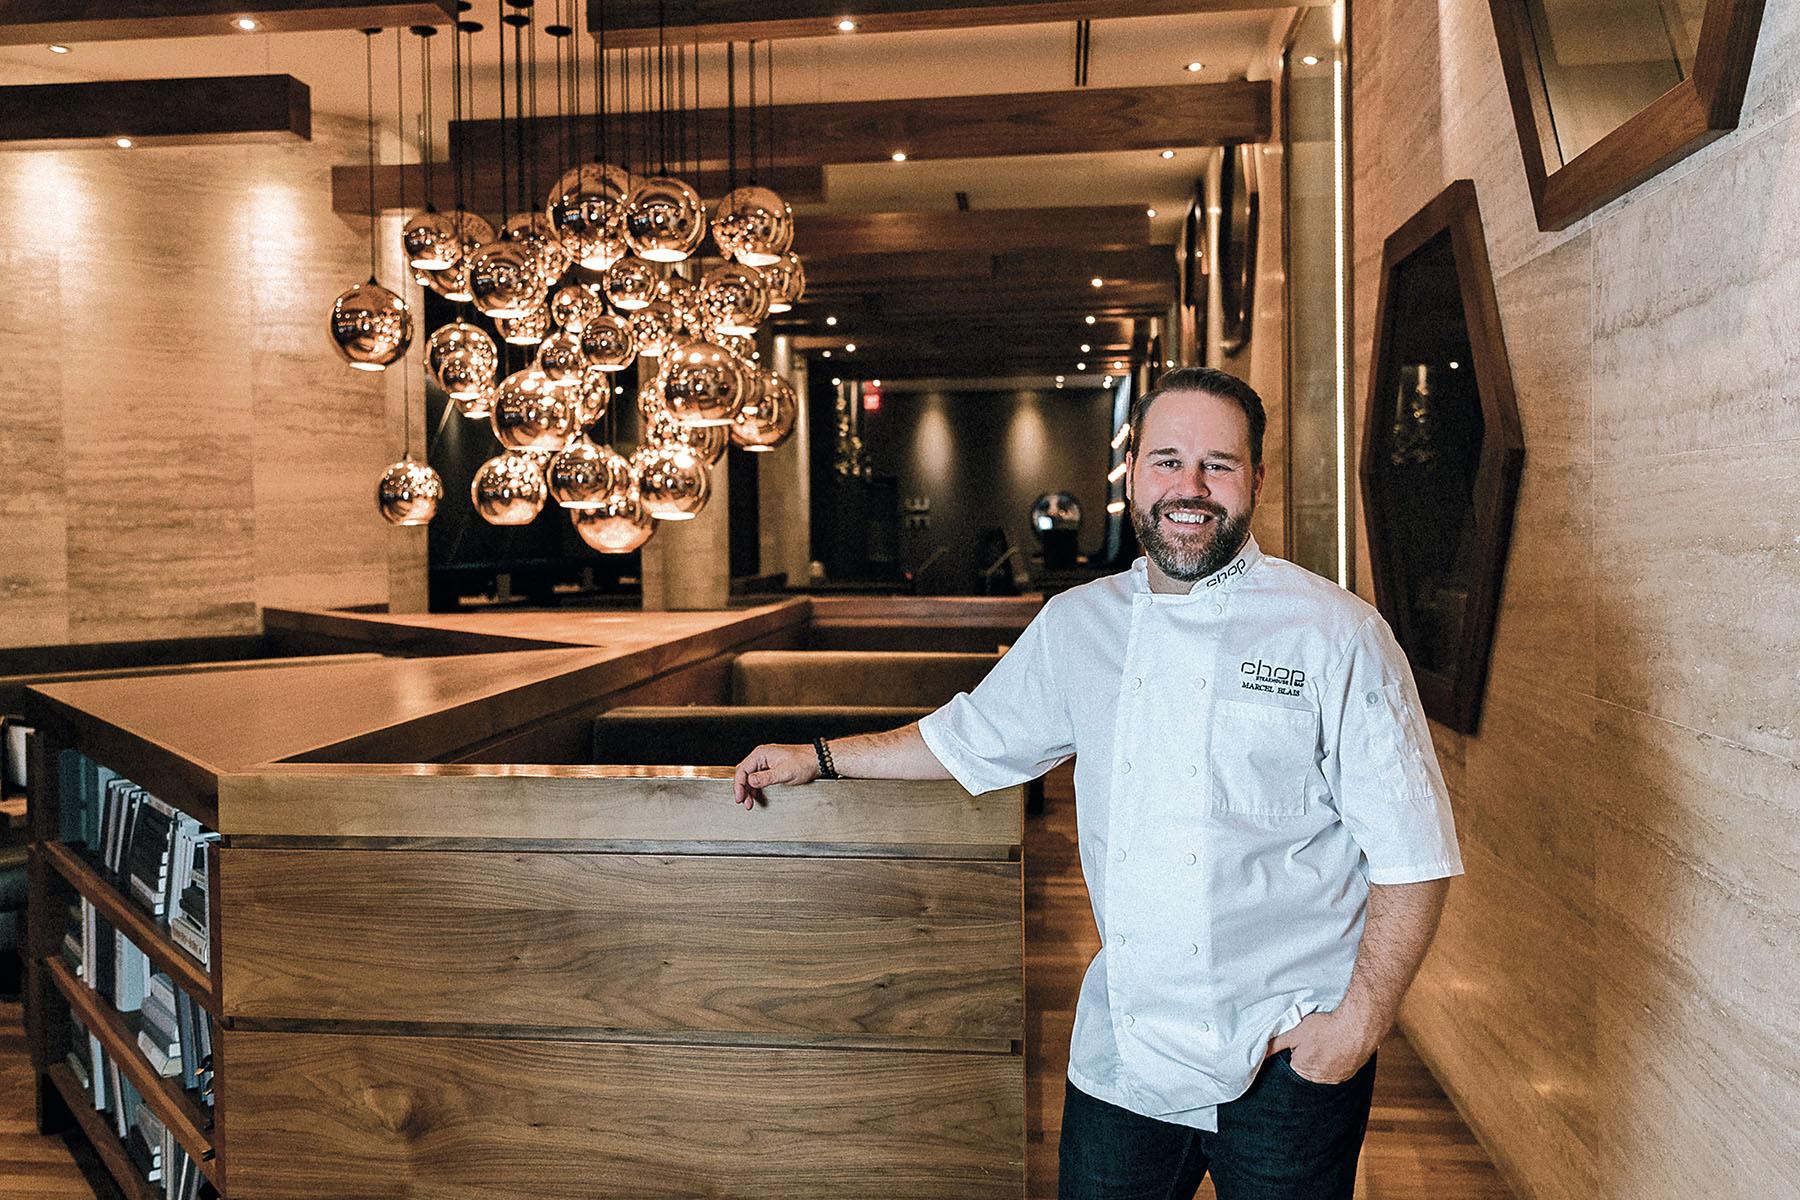 Marcel Blais, President of Chop Steakhouse & Bar